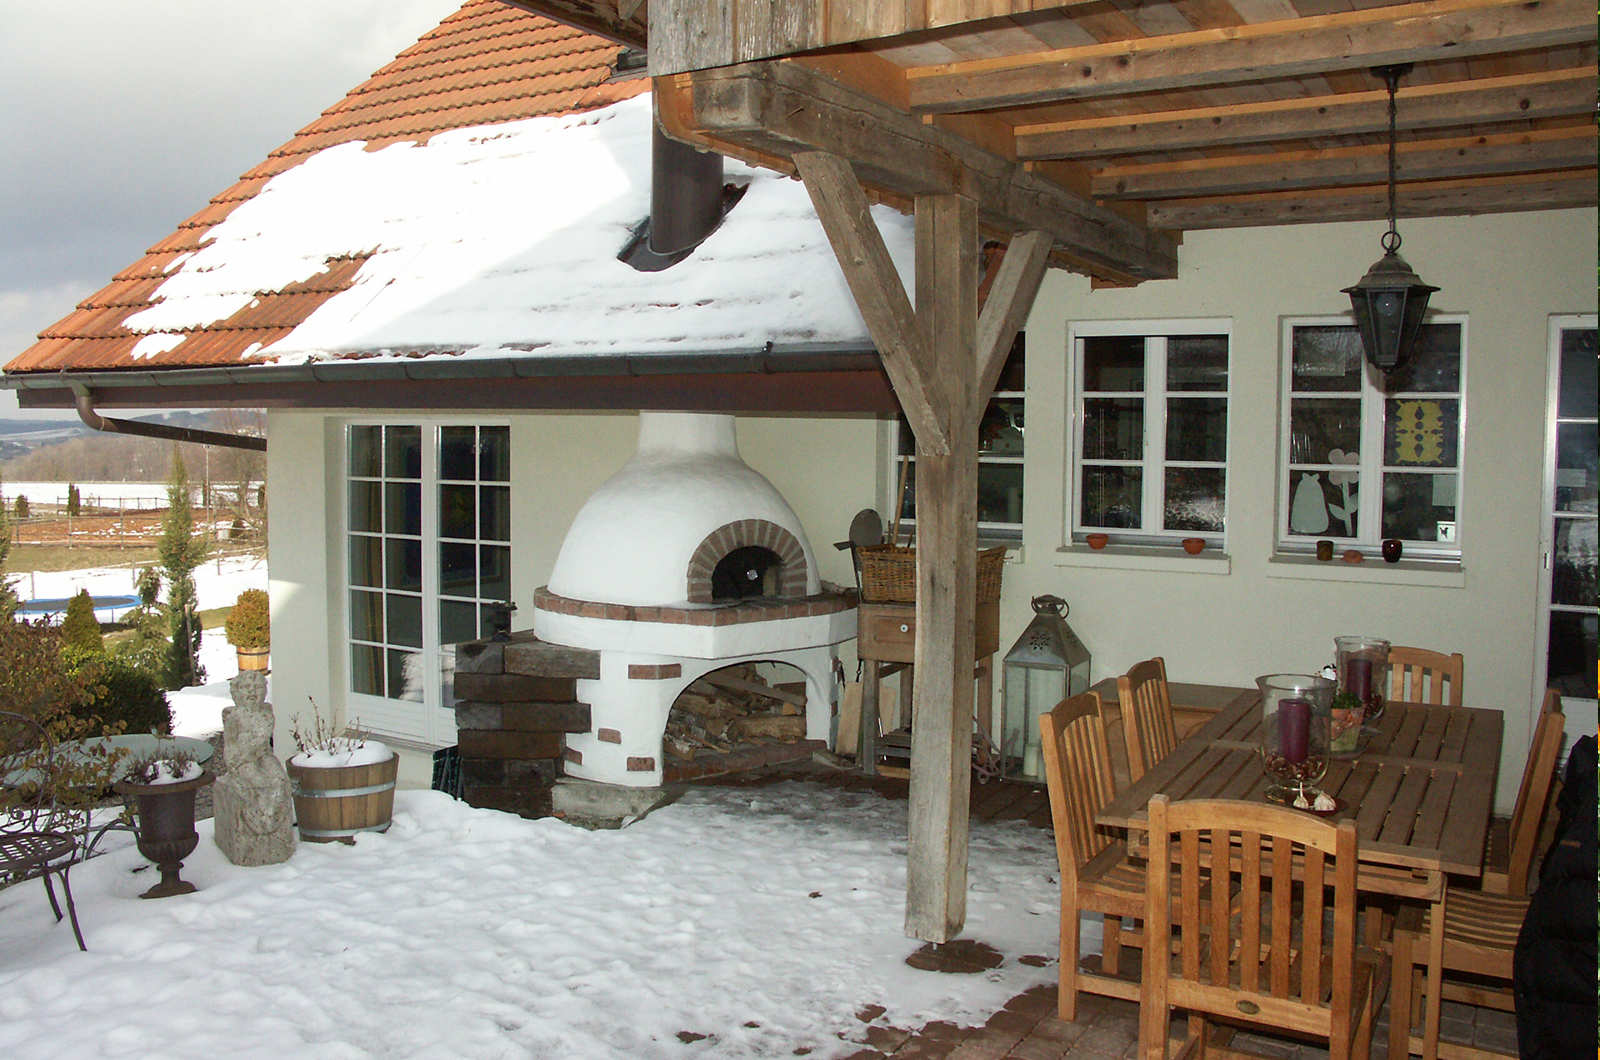 Familie Läderach / Ried bei Kerzers